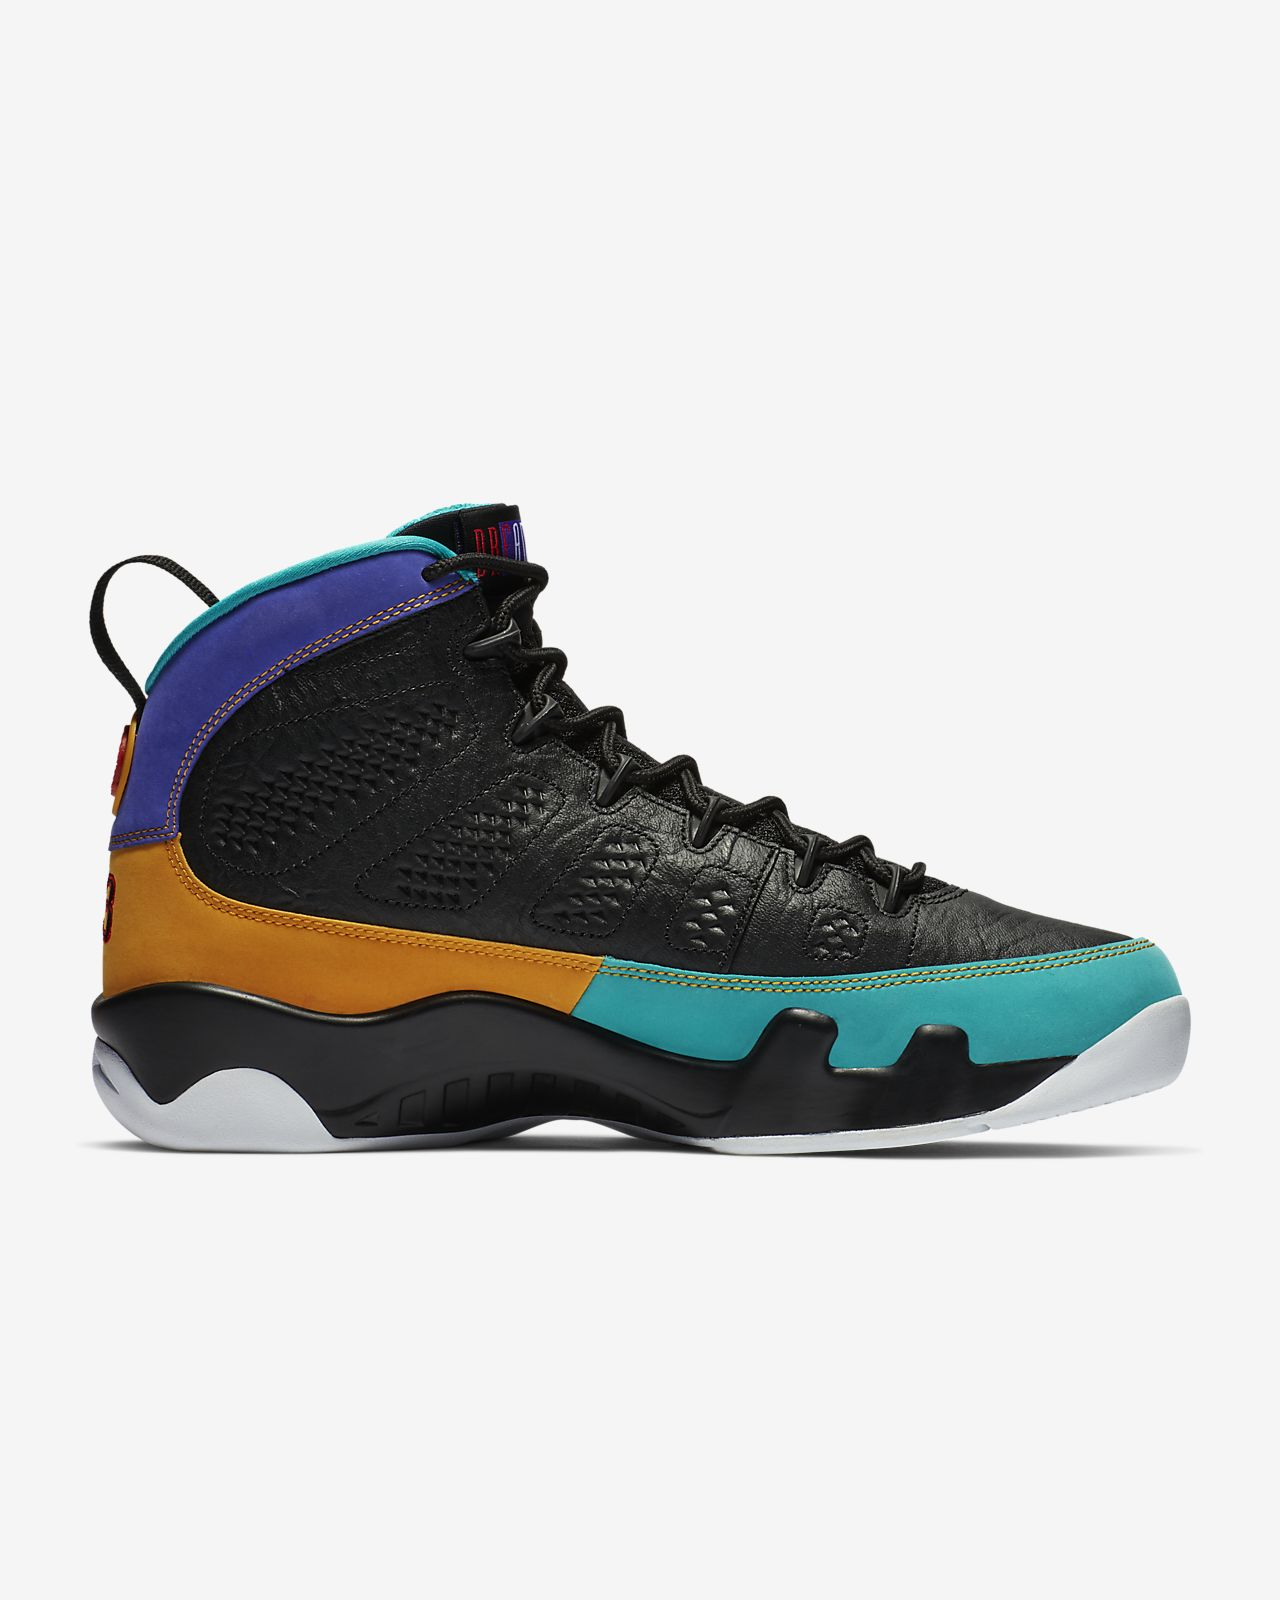 the latest bece1 80960 Low Resolution Air Jordan 9 Retro Men s Shoe Air Jordan 9 Retro Men s Shoe